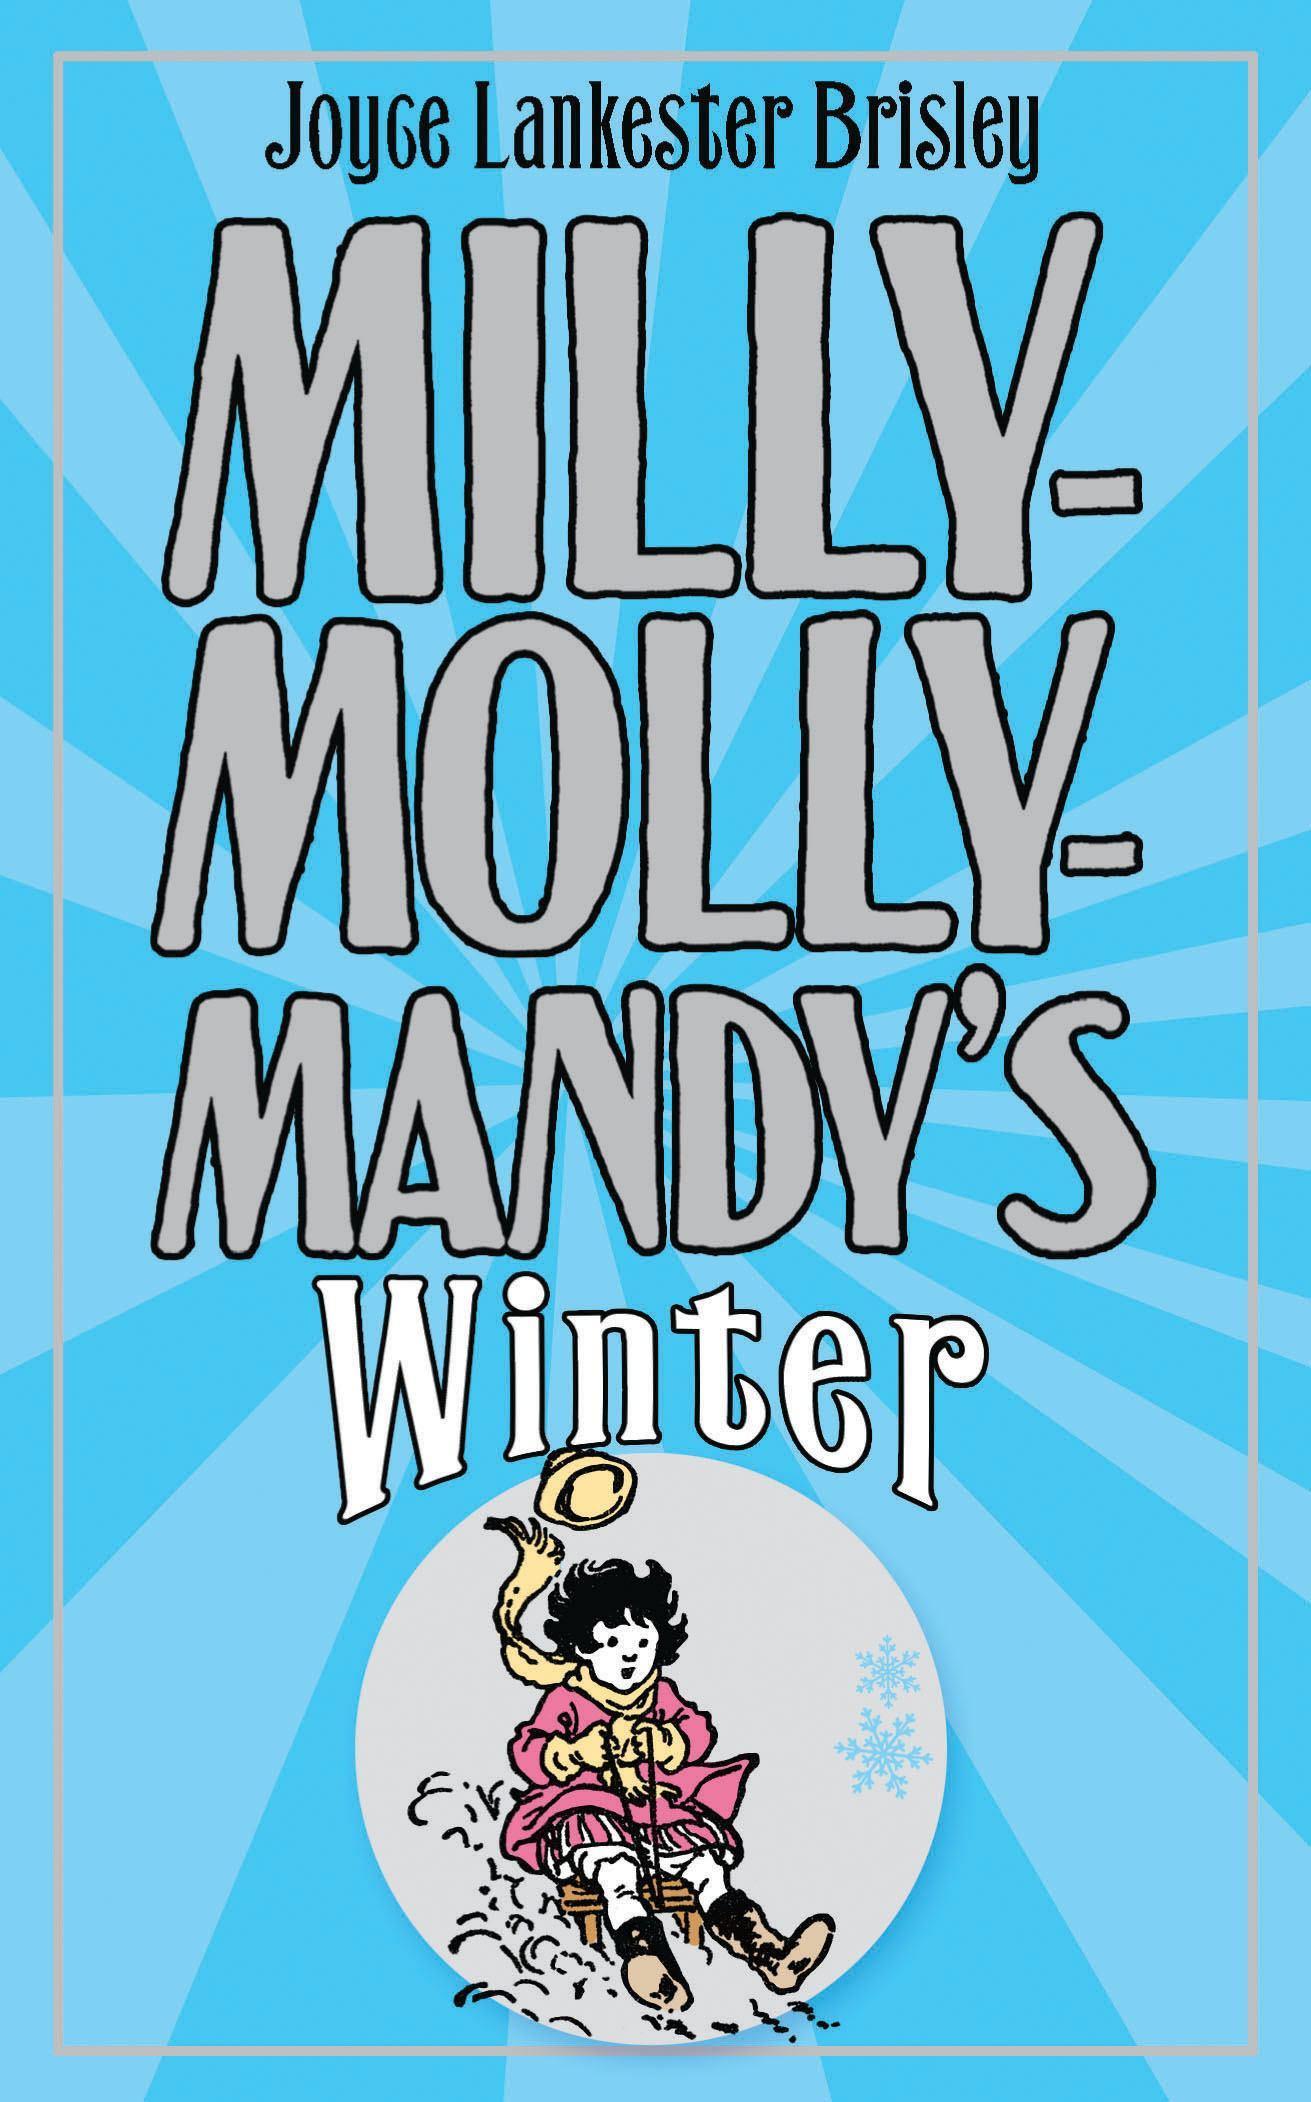 Milly-Molly-Mandy'sWinter